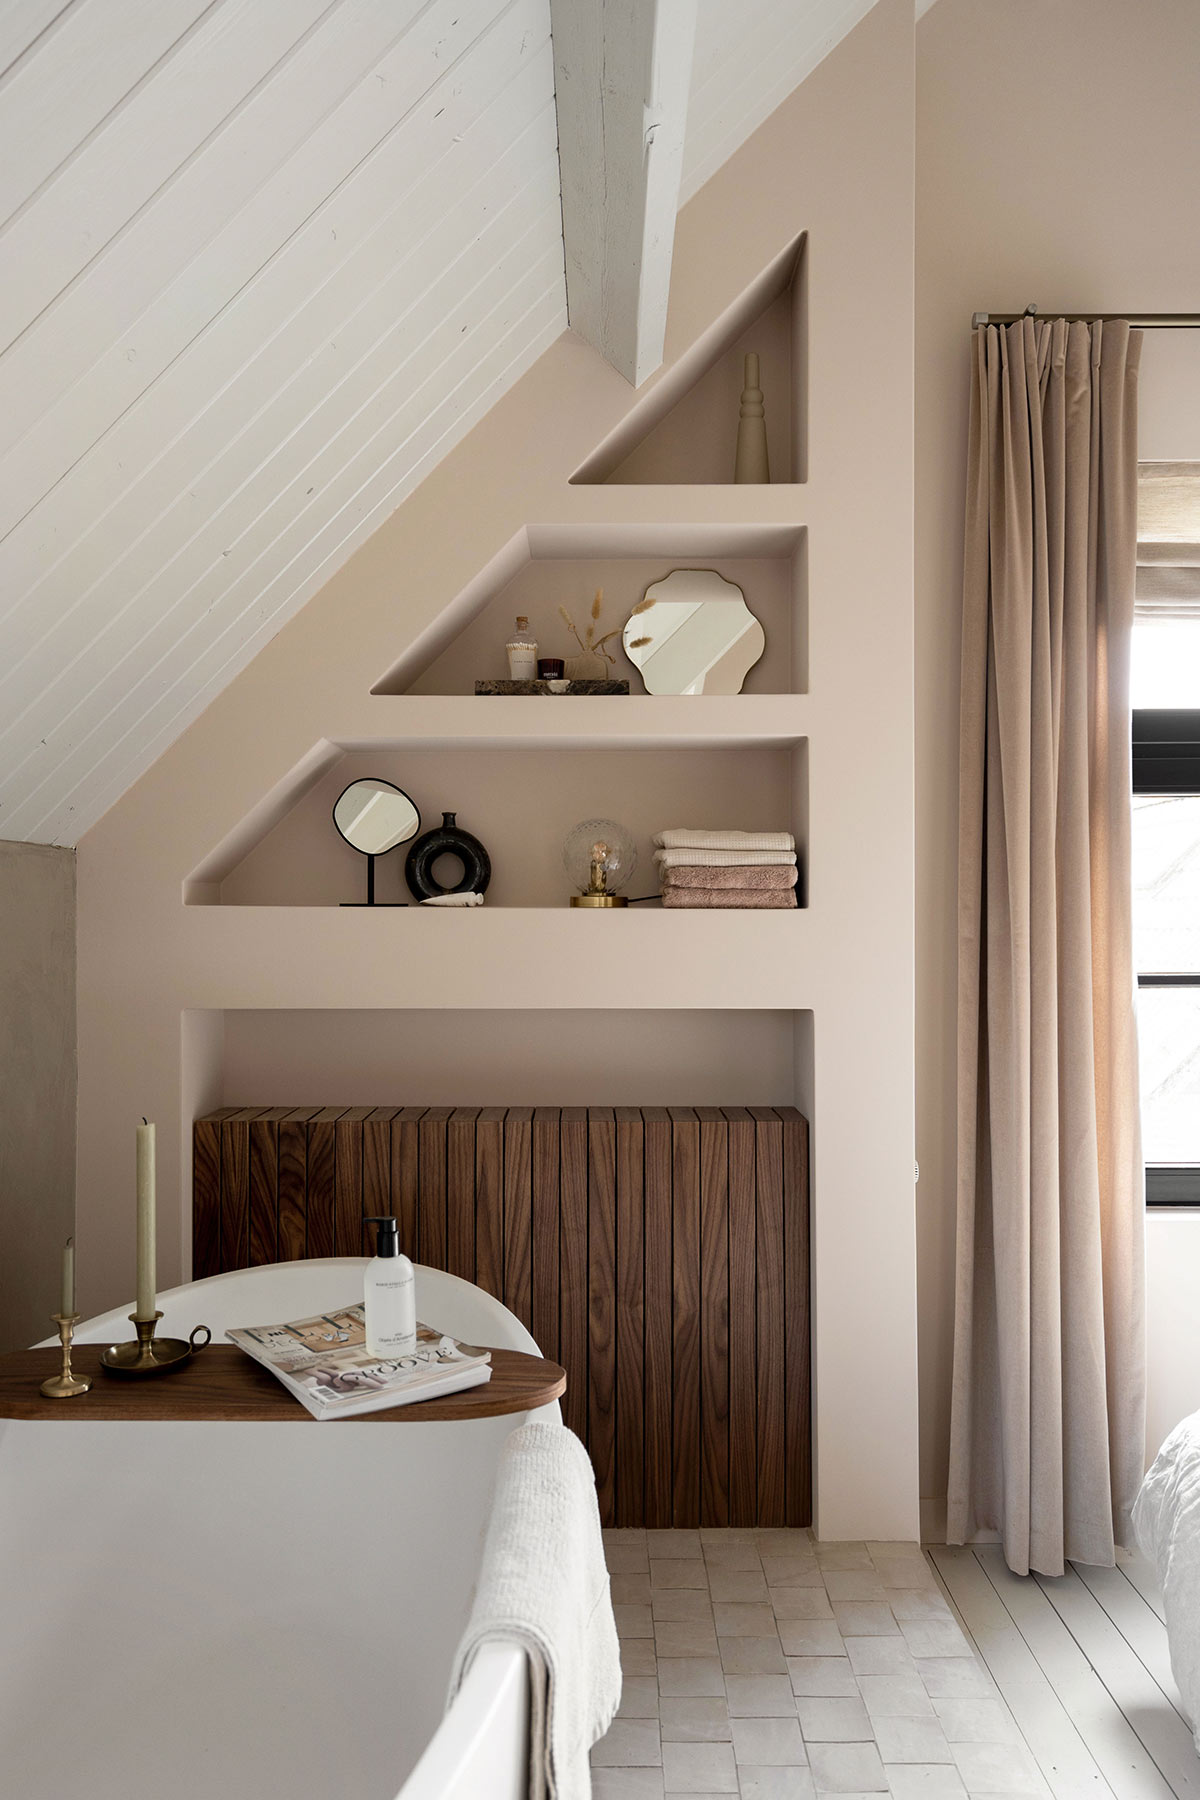 DIY badkamerkast en radiatorombouw - Tanja van Hoogdalem